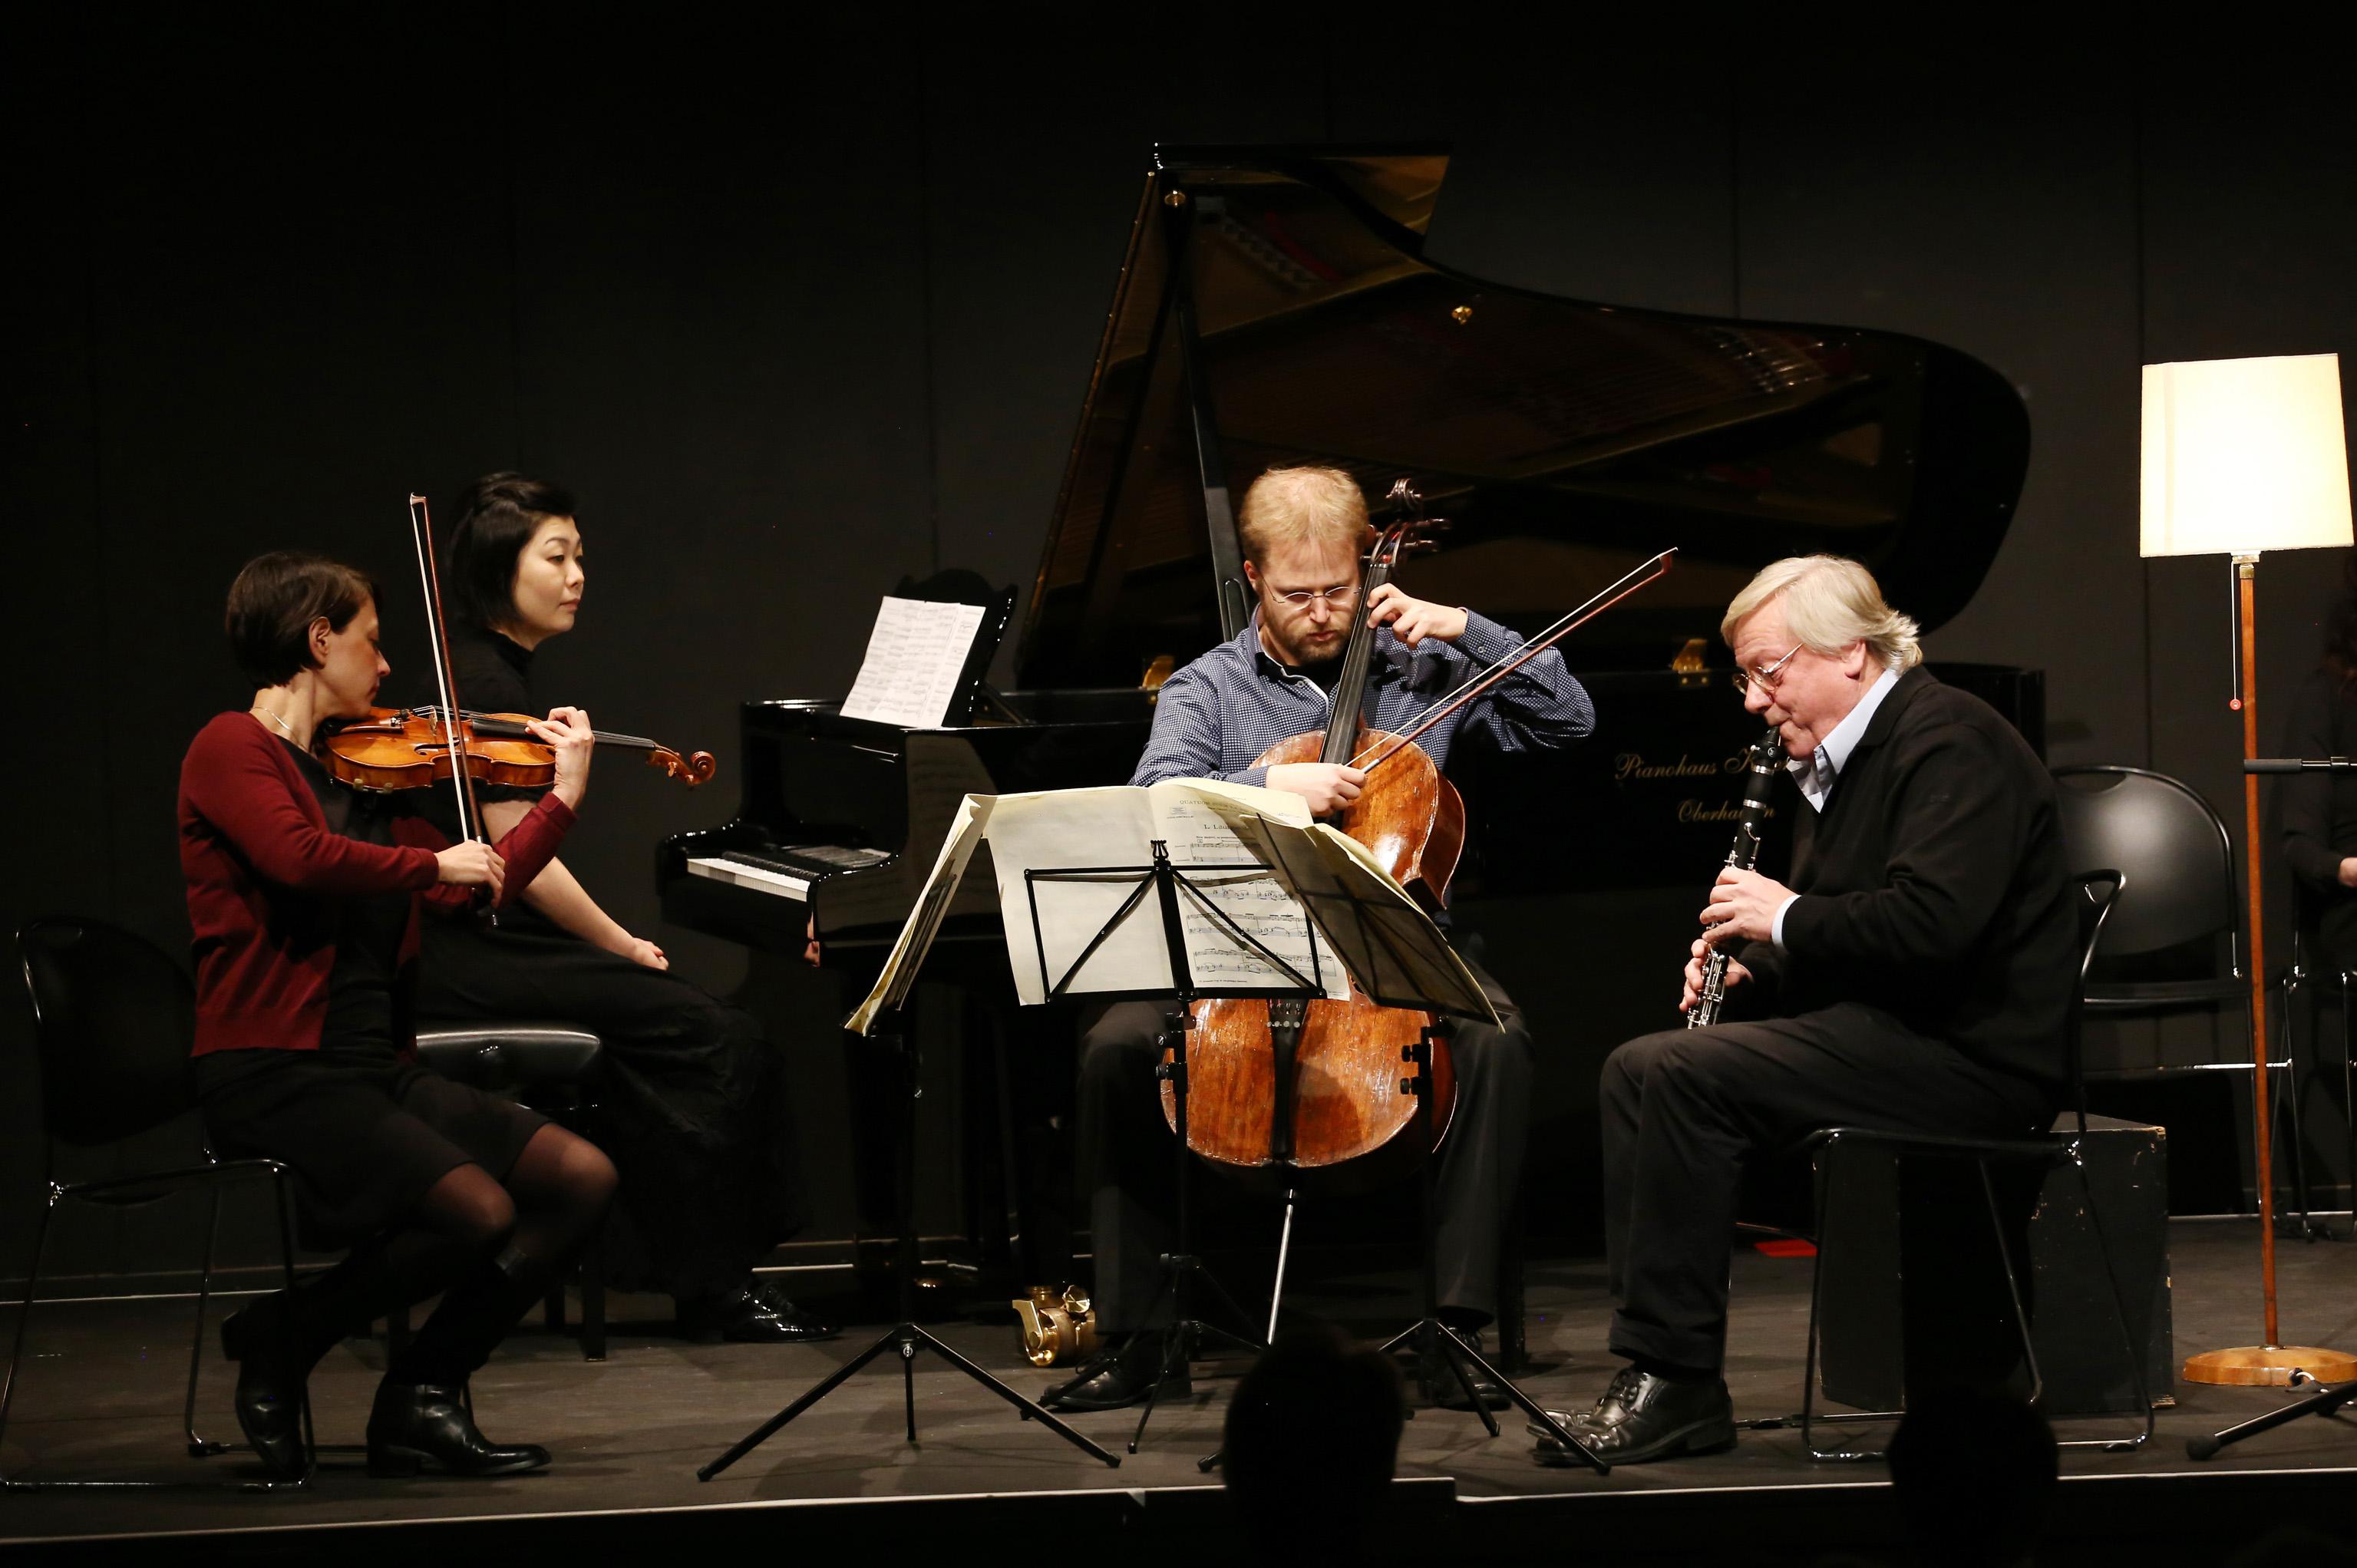 Bochumer Symphoniker und Sachiko Hara (Piano), Foto: Christoph Sebastian, Ruhrtriennale